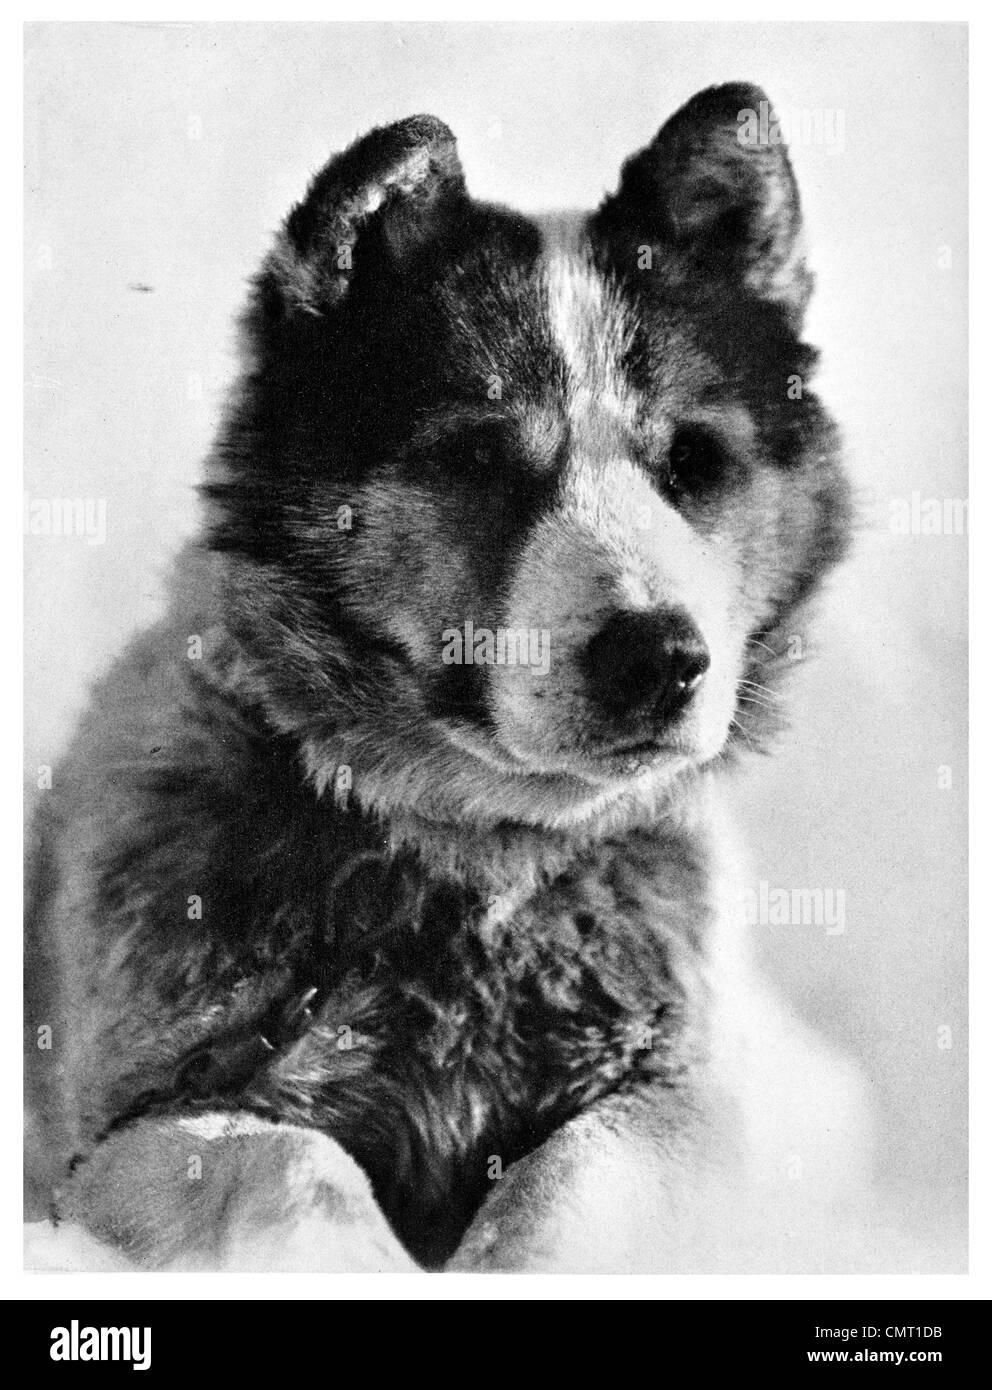 1912 Vida Lead sledge dog Scott Polar Expedition Terra Nova Expedition, officially the British Antarctic Expedition - Stock Image